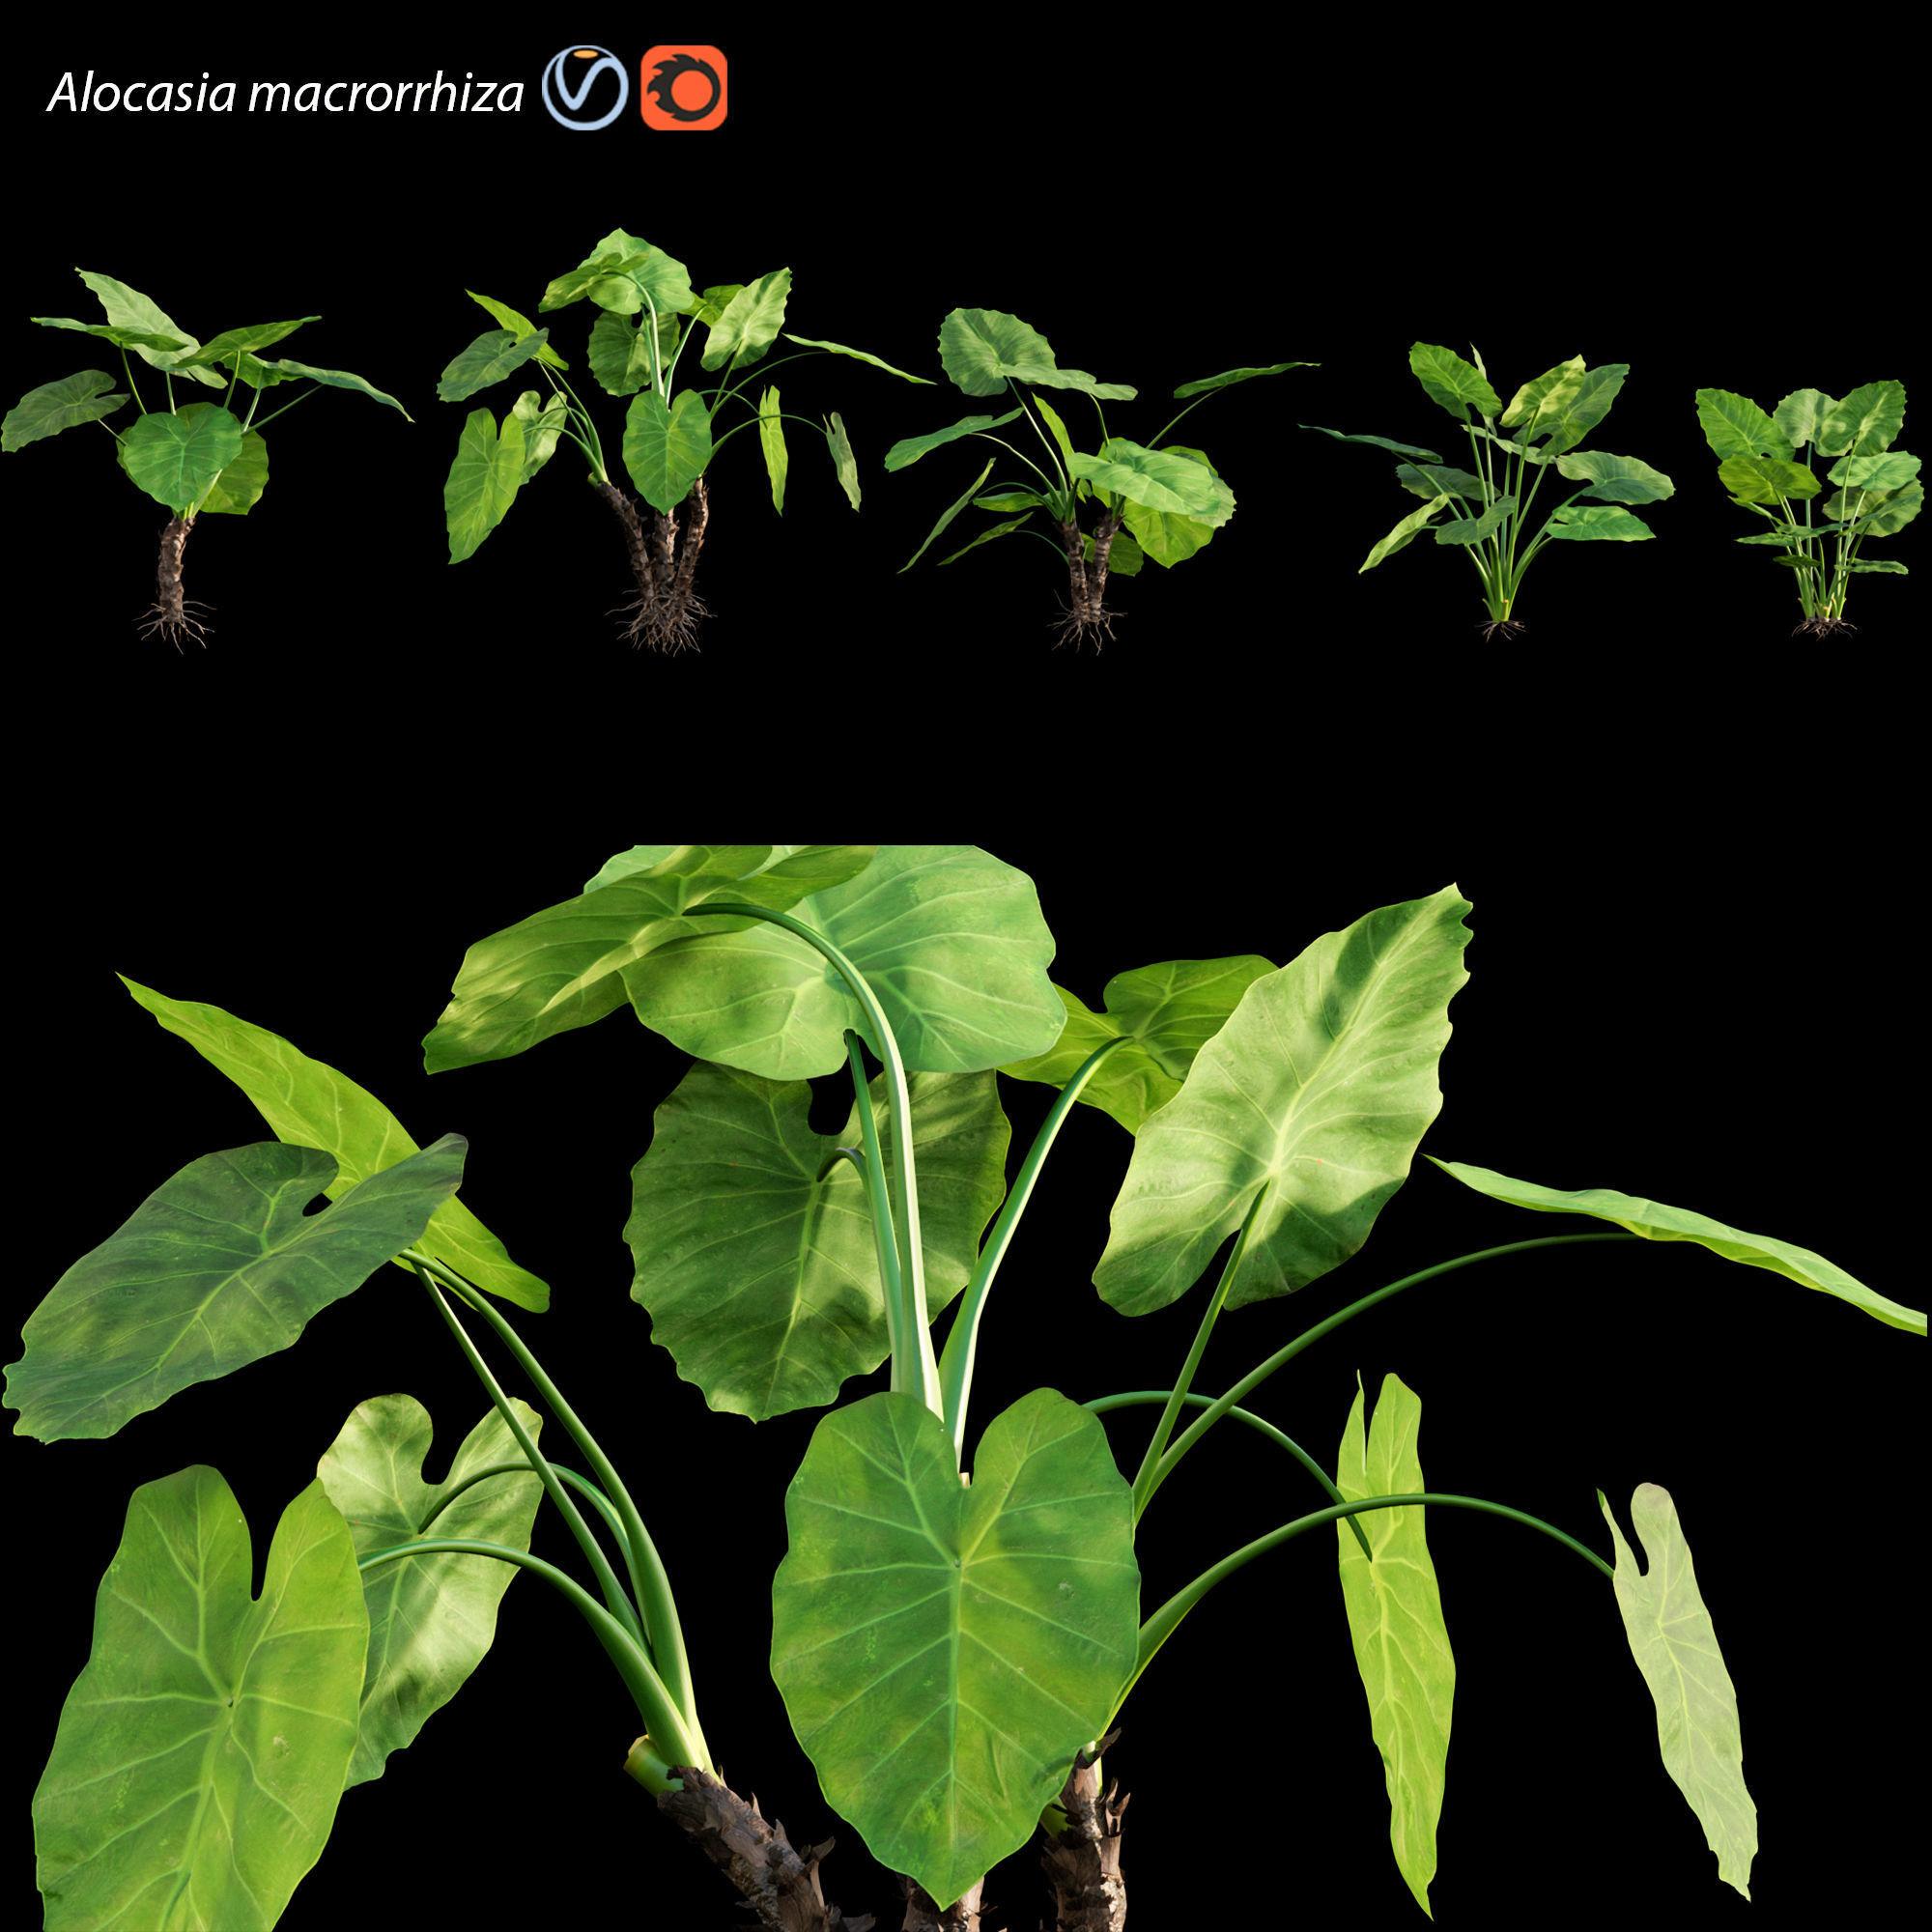 Alocasia macrorrhiza - Elephant Ears